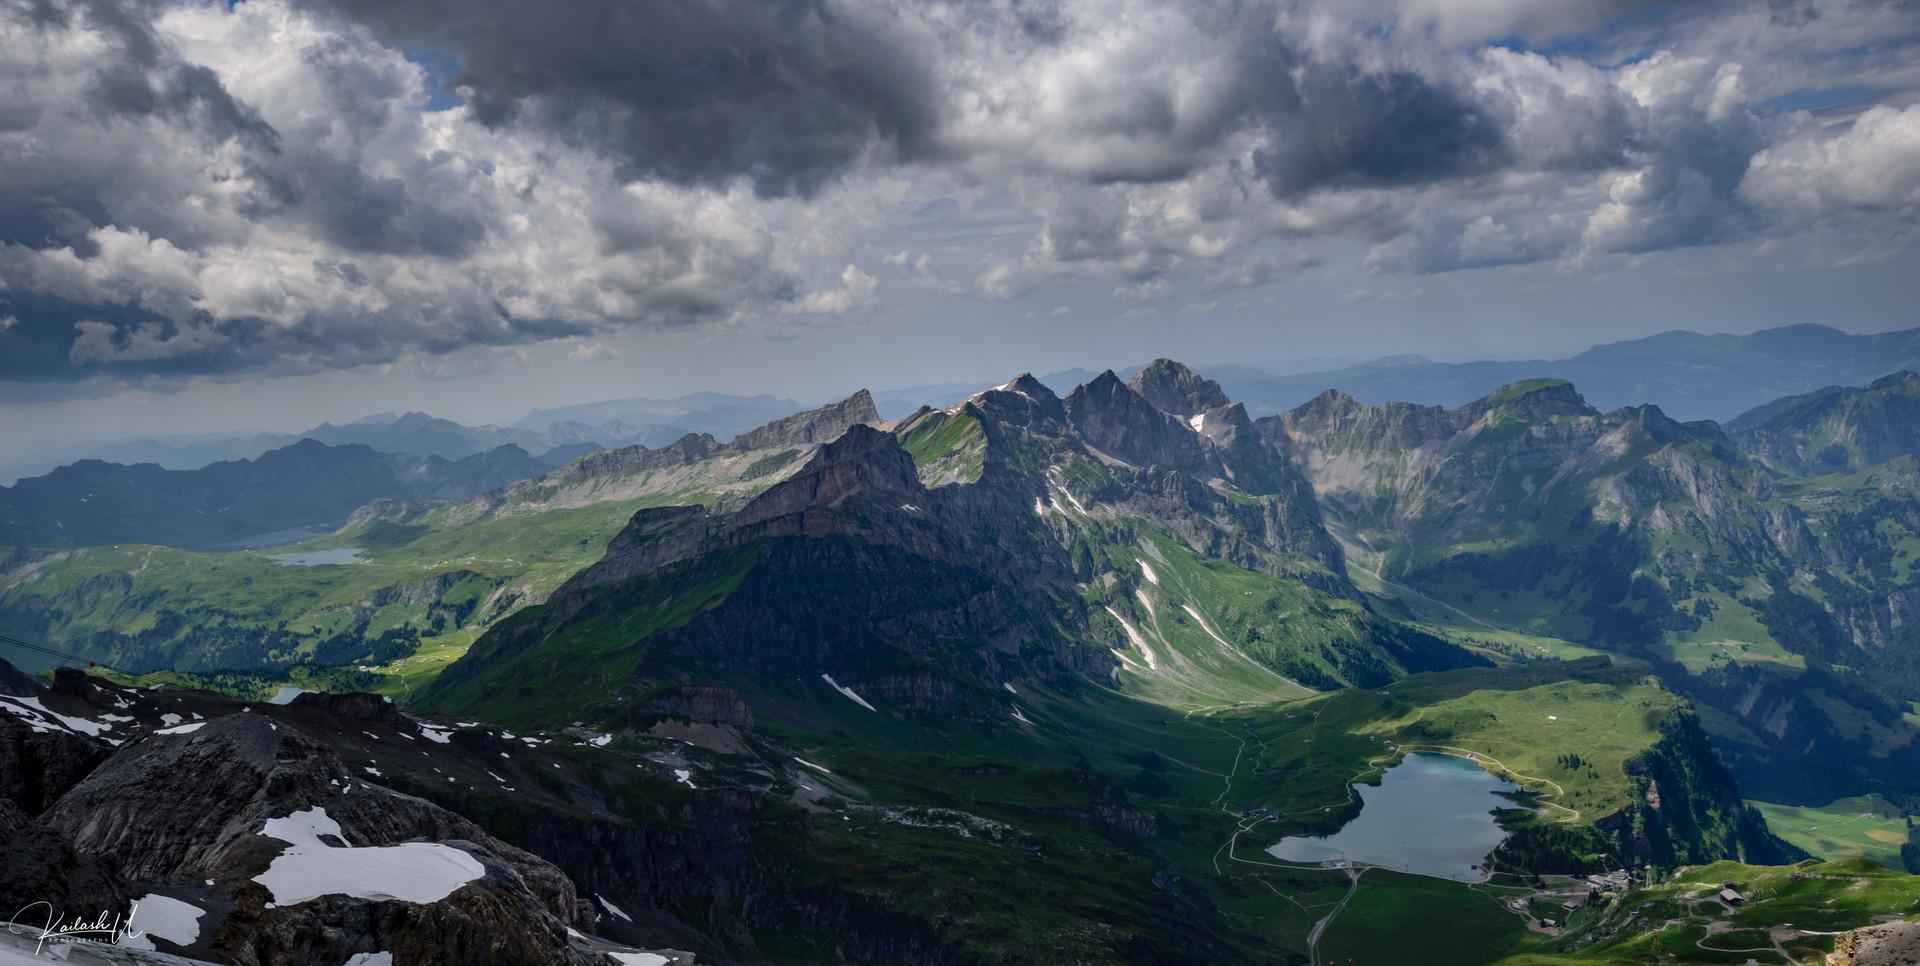 Alpine lake in Switzerland